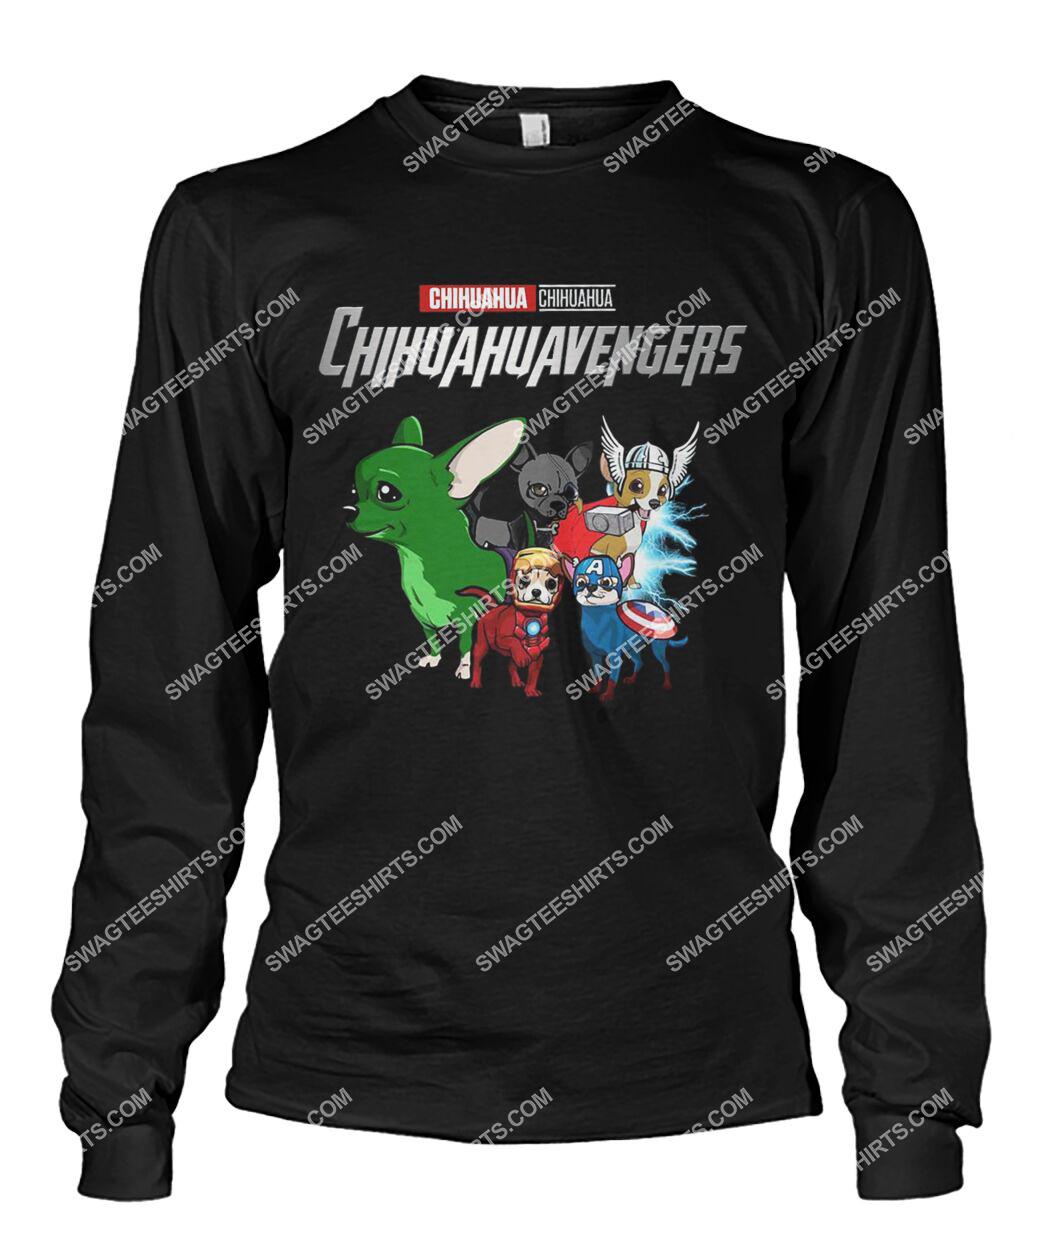 chihuahua chihuahuavengers marvel avengers dogs lover sweatshirt 1